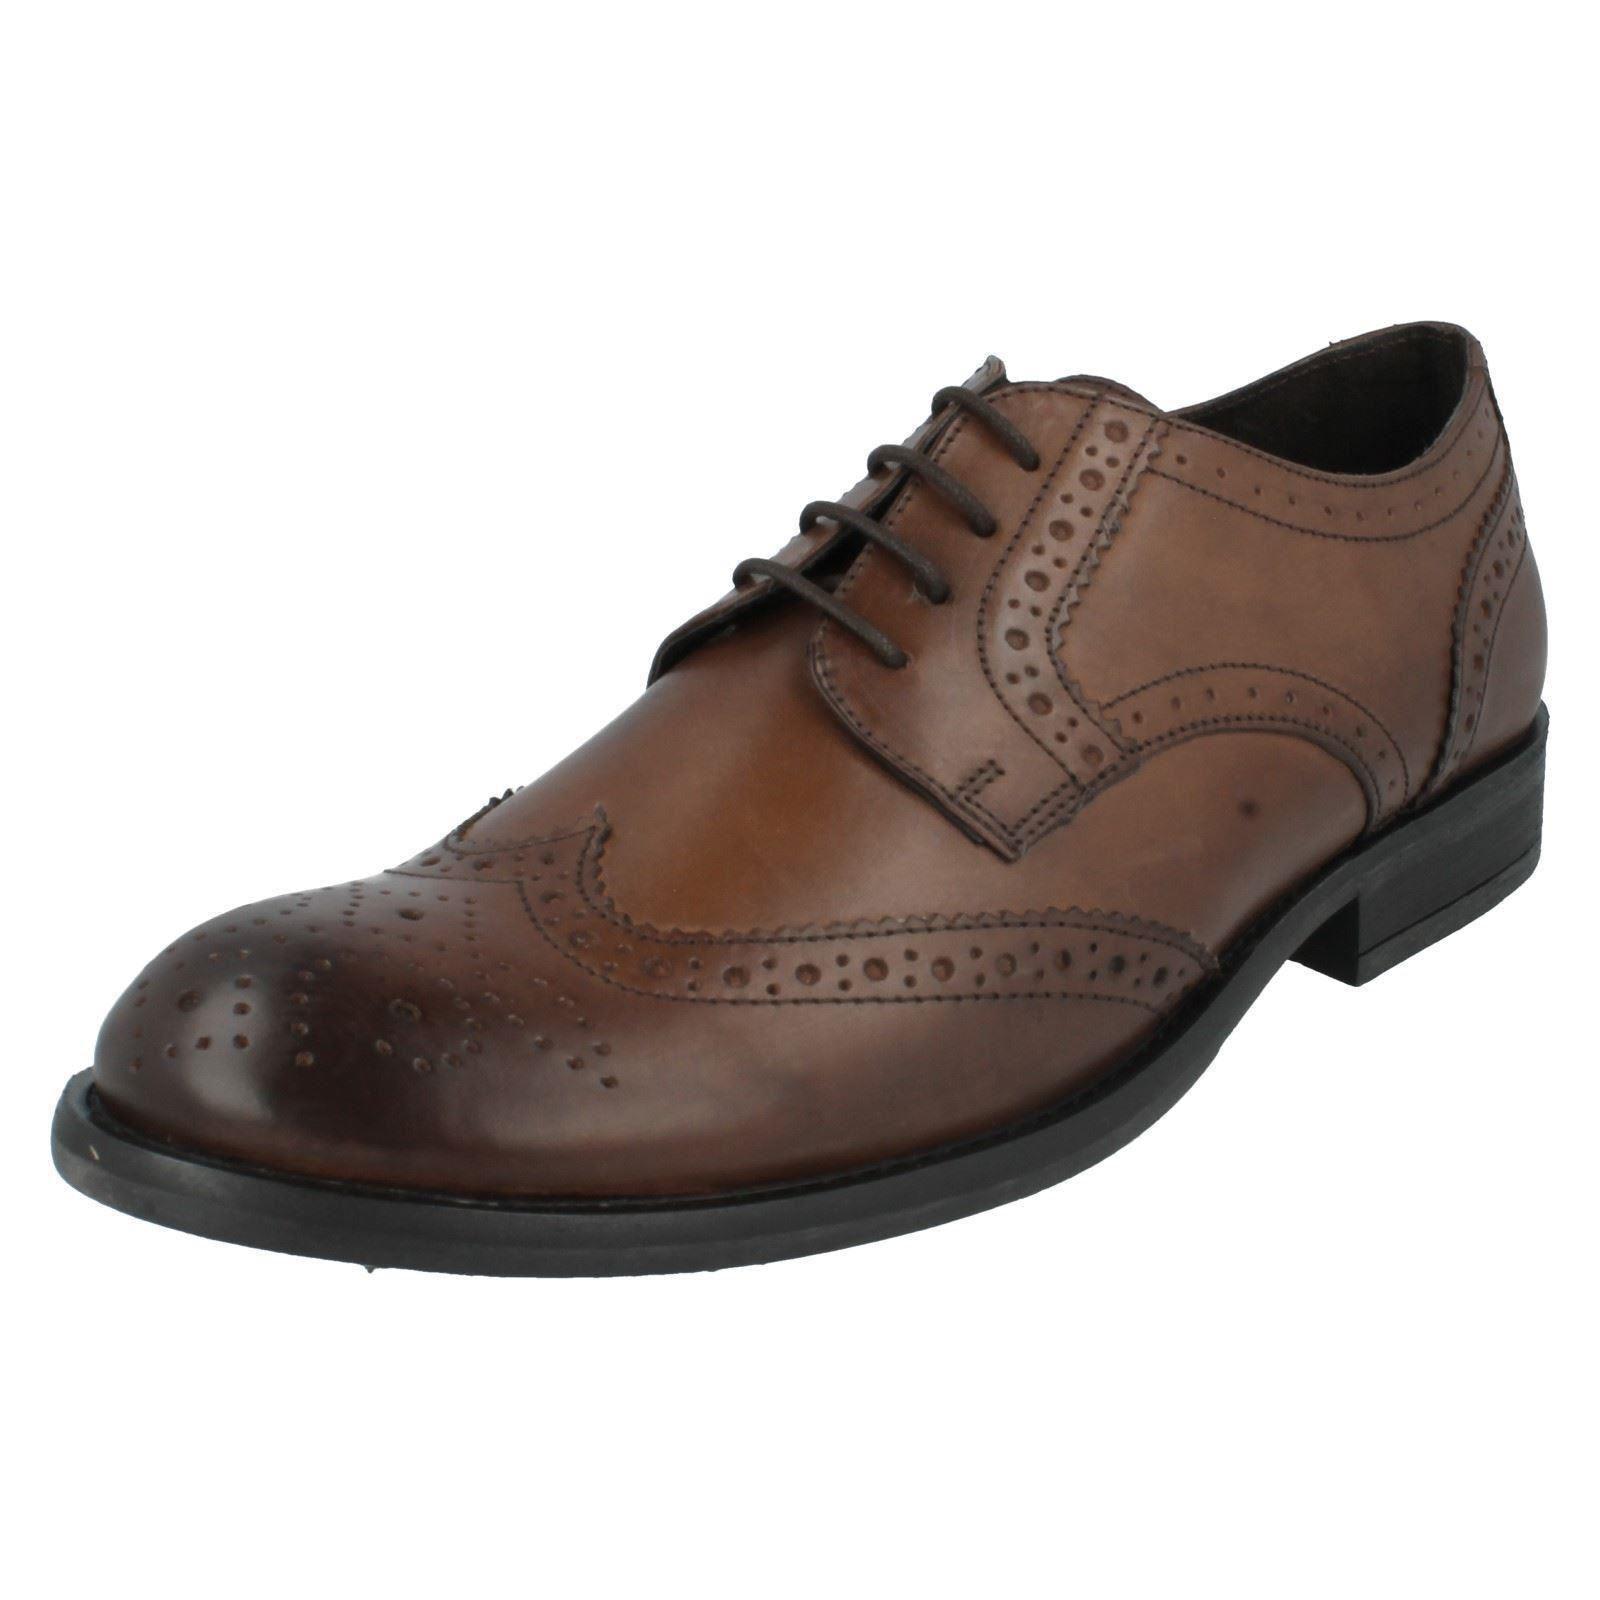 Herren Base London London London Brogues Leder Schuhe Stil Eiche MTO 53dd2c